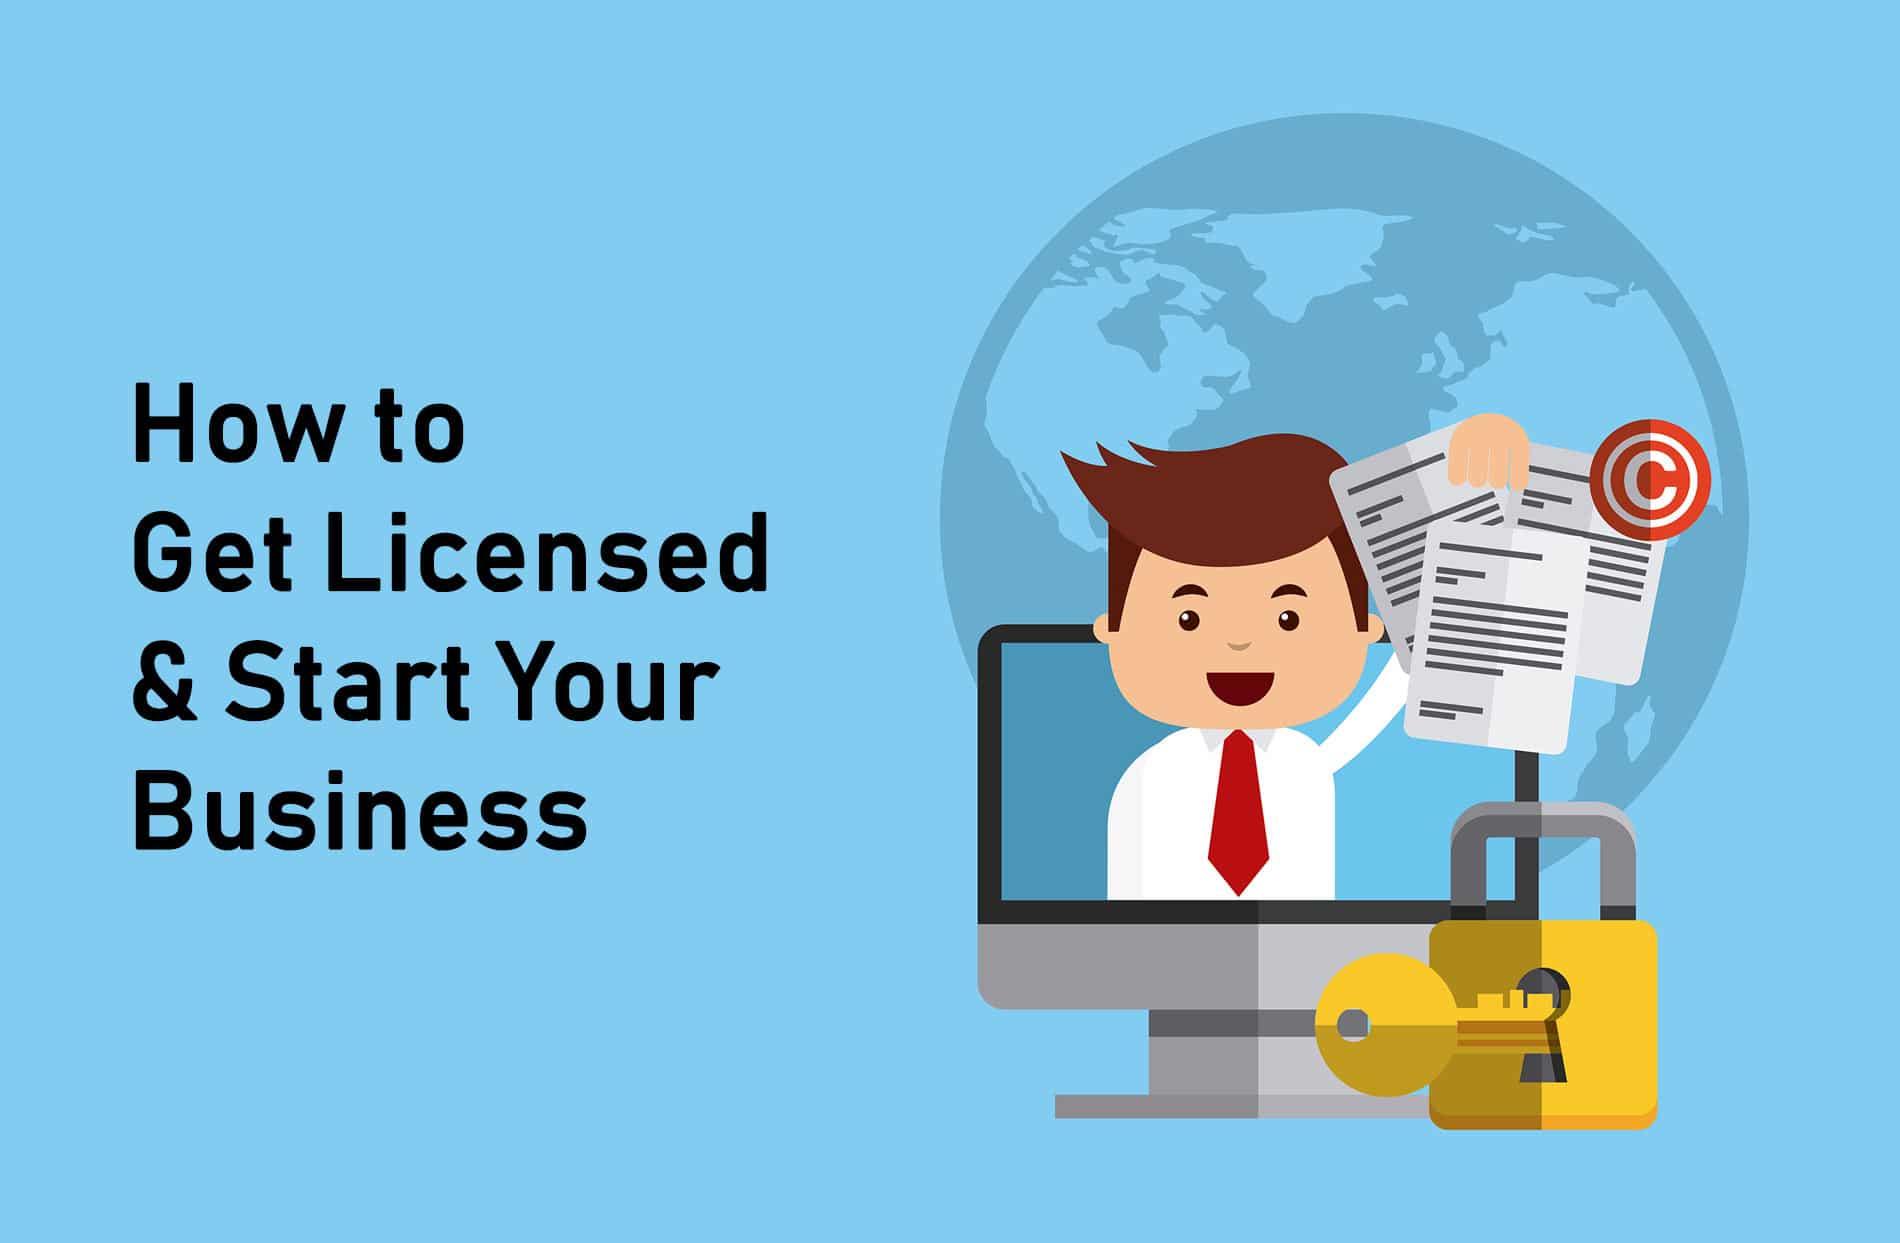 Get Licensed & Start Your Business